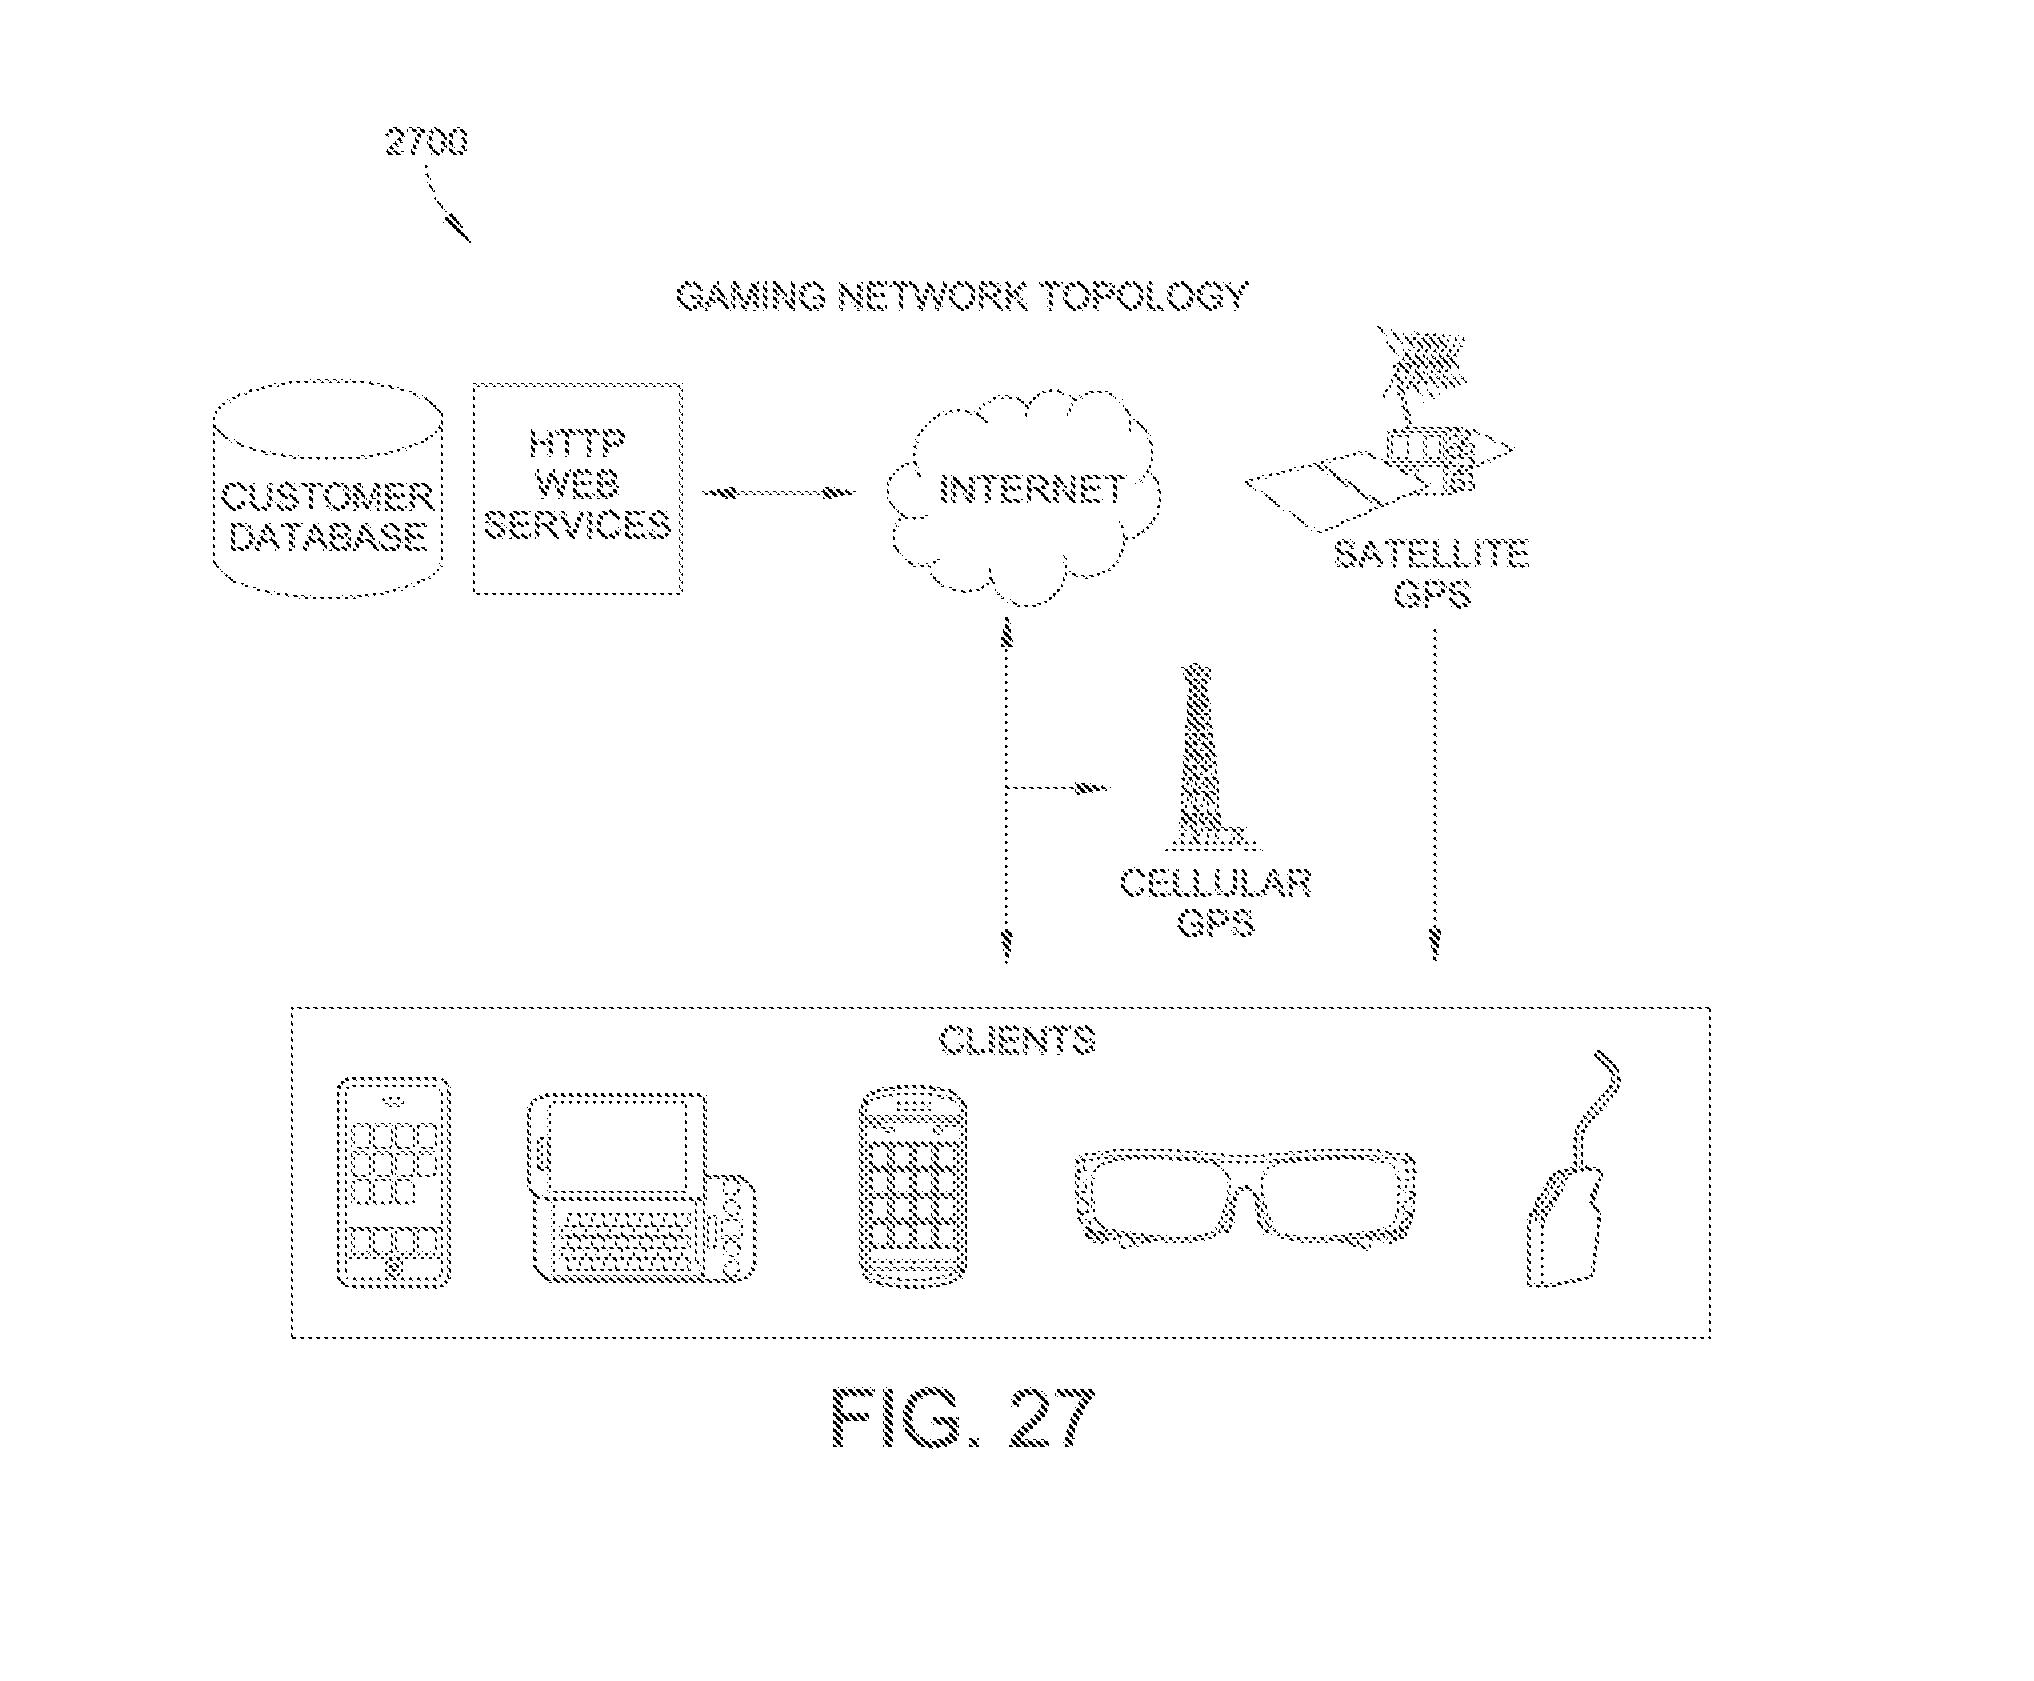 Patent US 8,482,859 B2